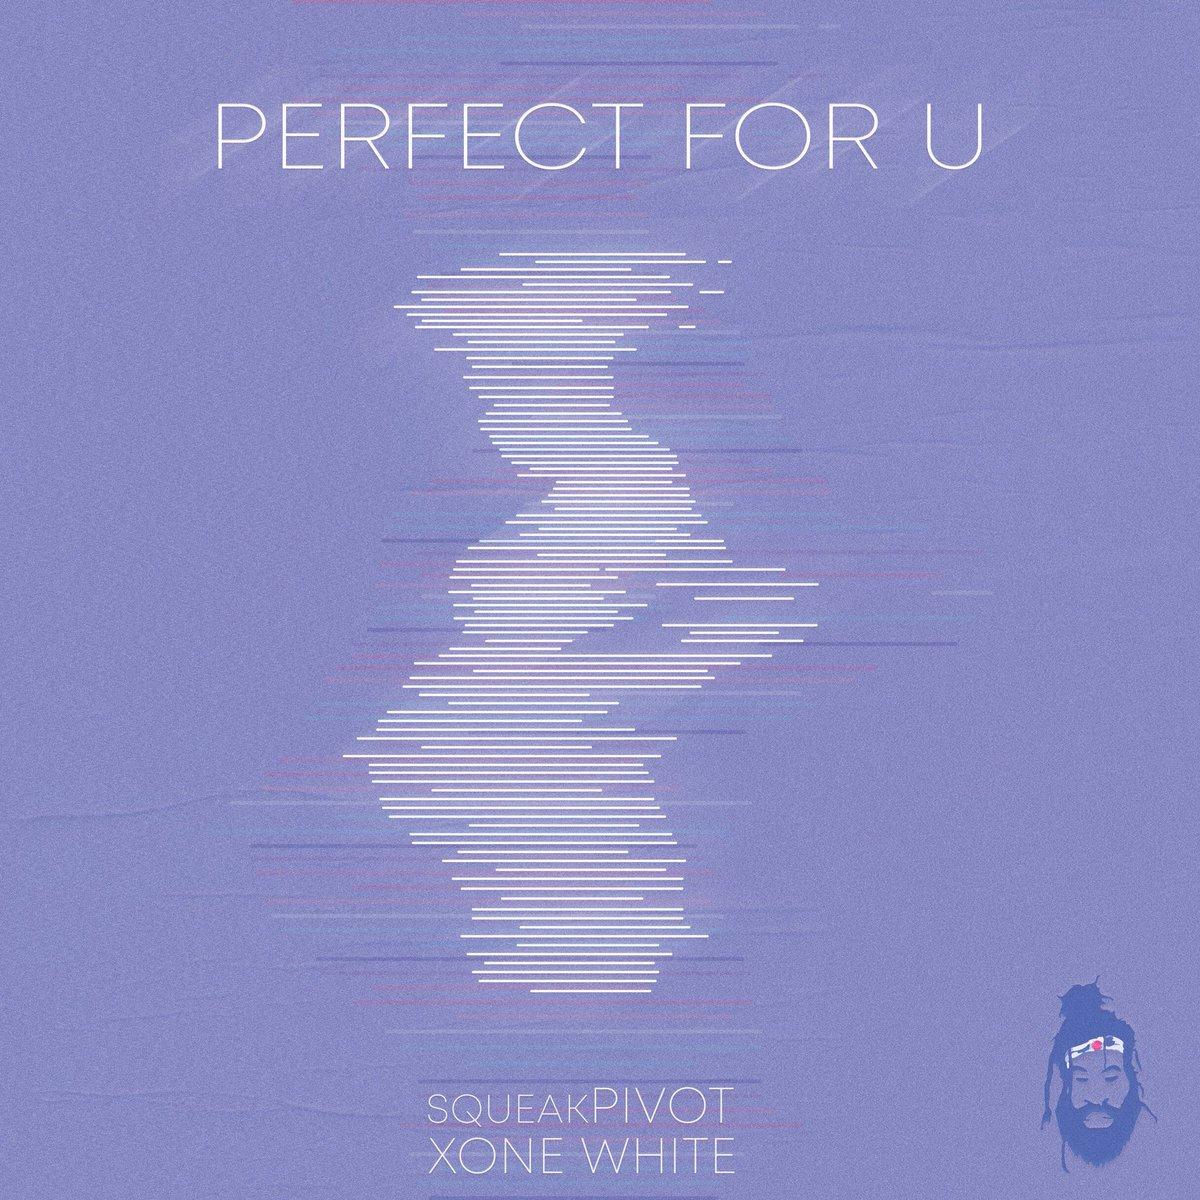 Perfect For U. production • squeak vocals/written • @XoneWhite [smarturl.it/PerfectForU]